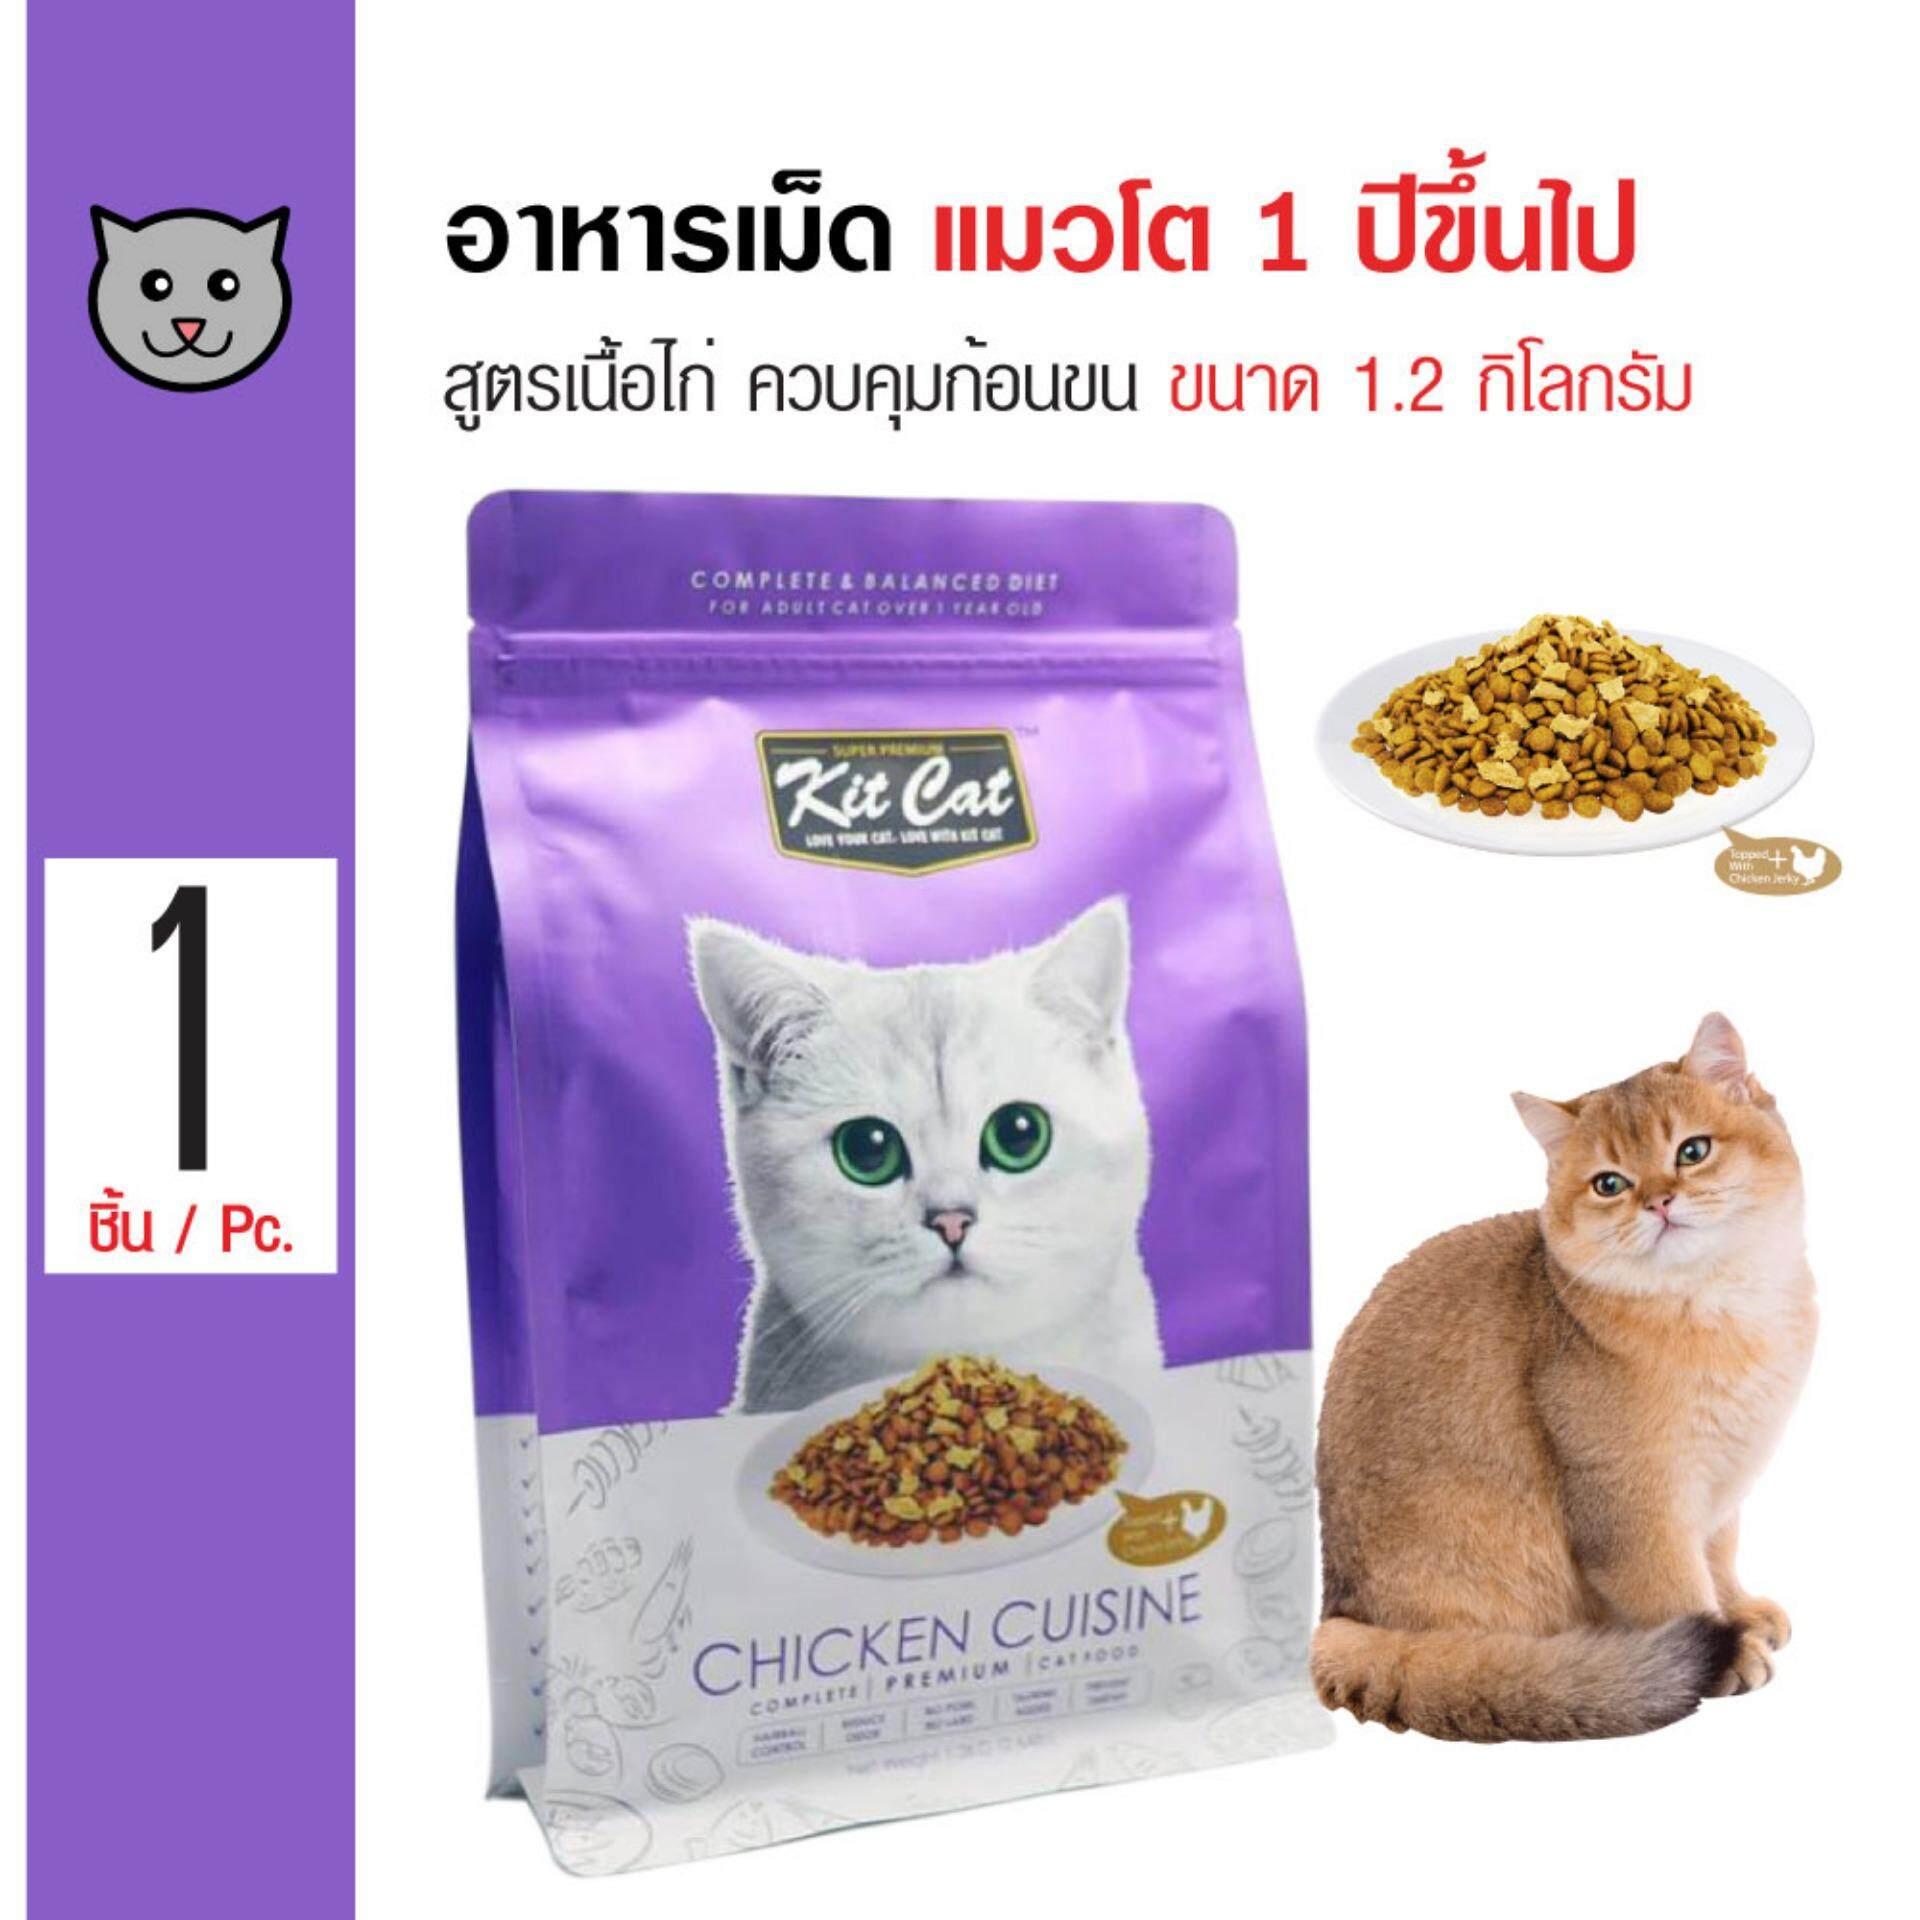 Kit Cat Chicken Cuisine อาหารแมว สูตรเนื้อไก่ ควบคุมก้อนขน สำหรับแมวโต 1 ปีขึ้นไป (1.2 กิโลกรัม/ ถุง)